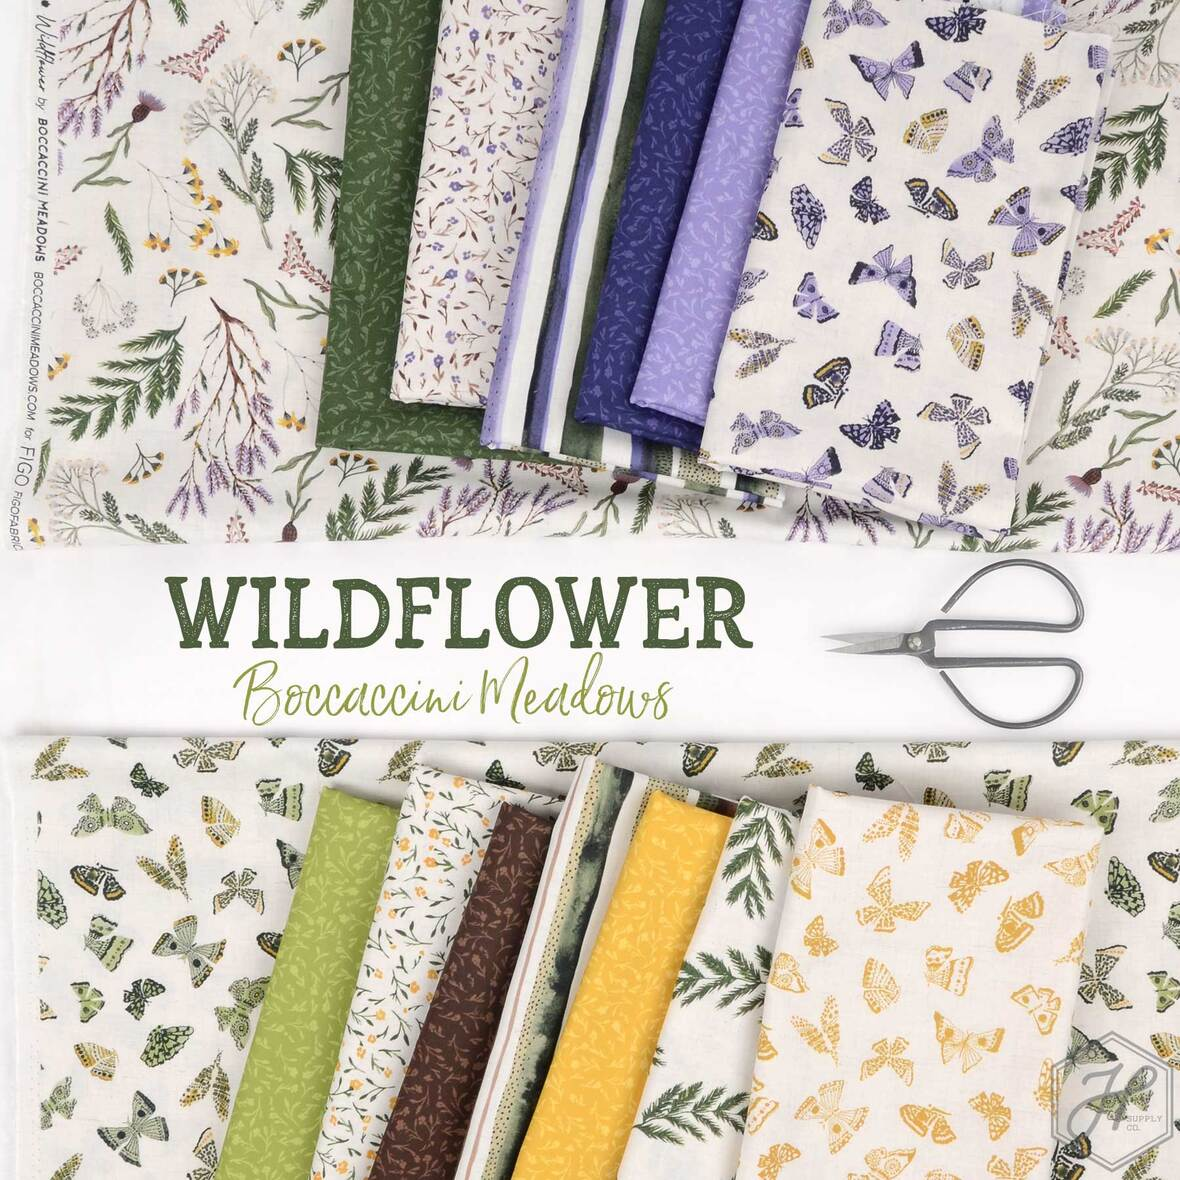 Wildflower-Boccaccini-Meadows-fabric-for-Figo-at-Hawthorne-Supply-Co